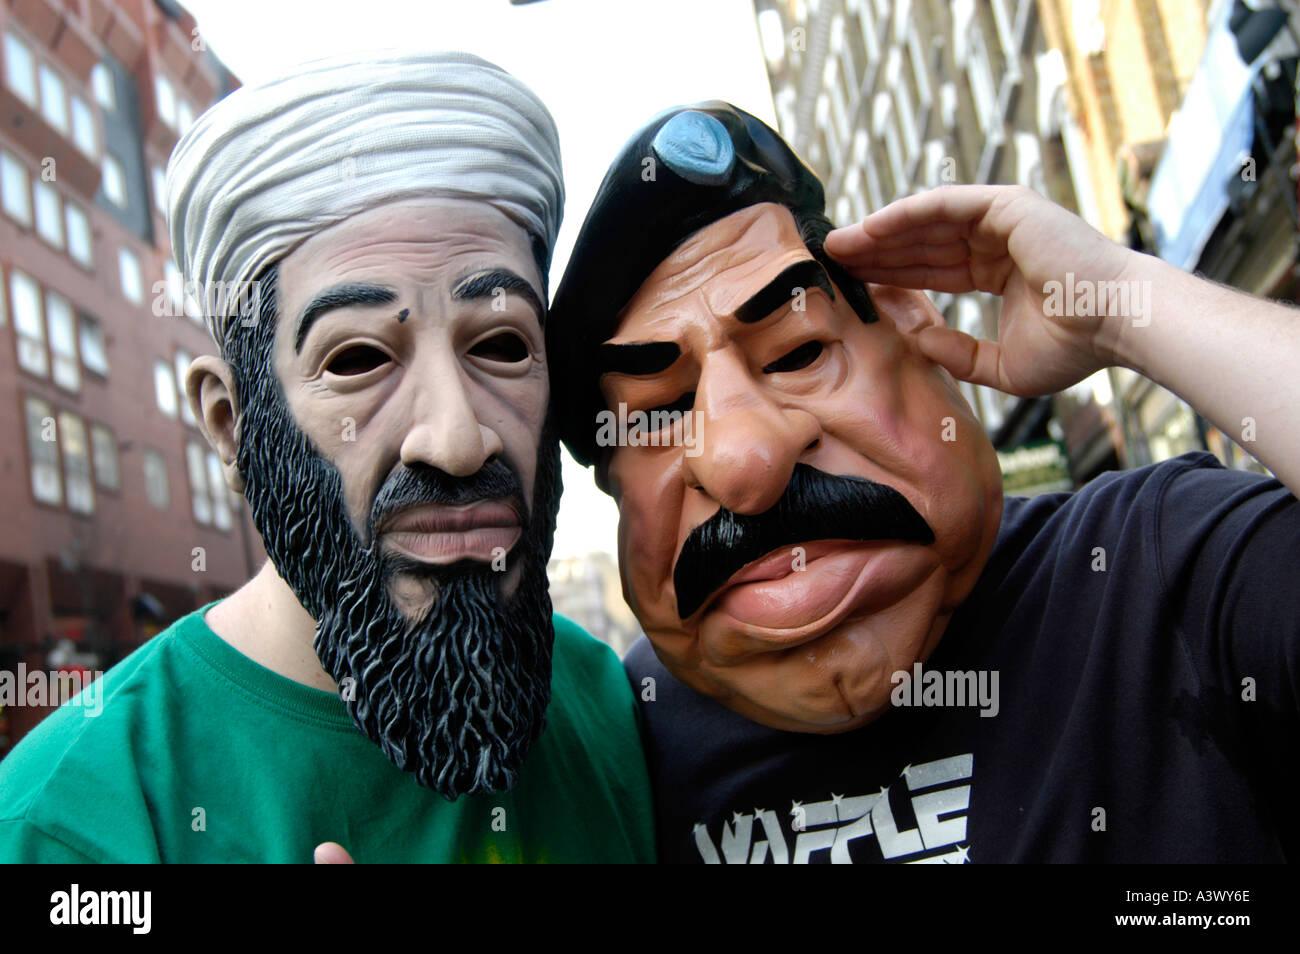 Osama Bin Laden Mask Stock Photos & Osama Bin Laden Mask Stock ...